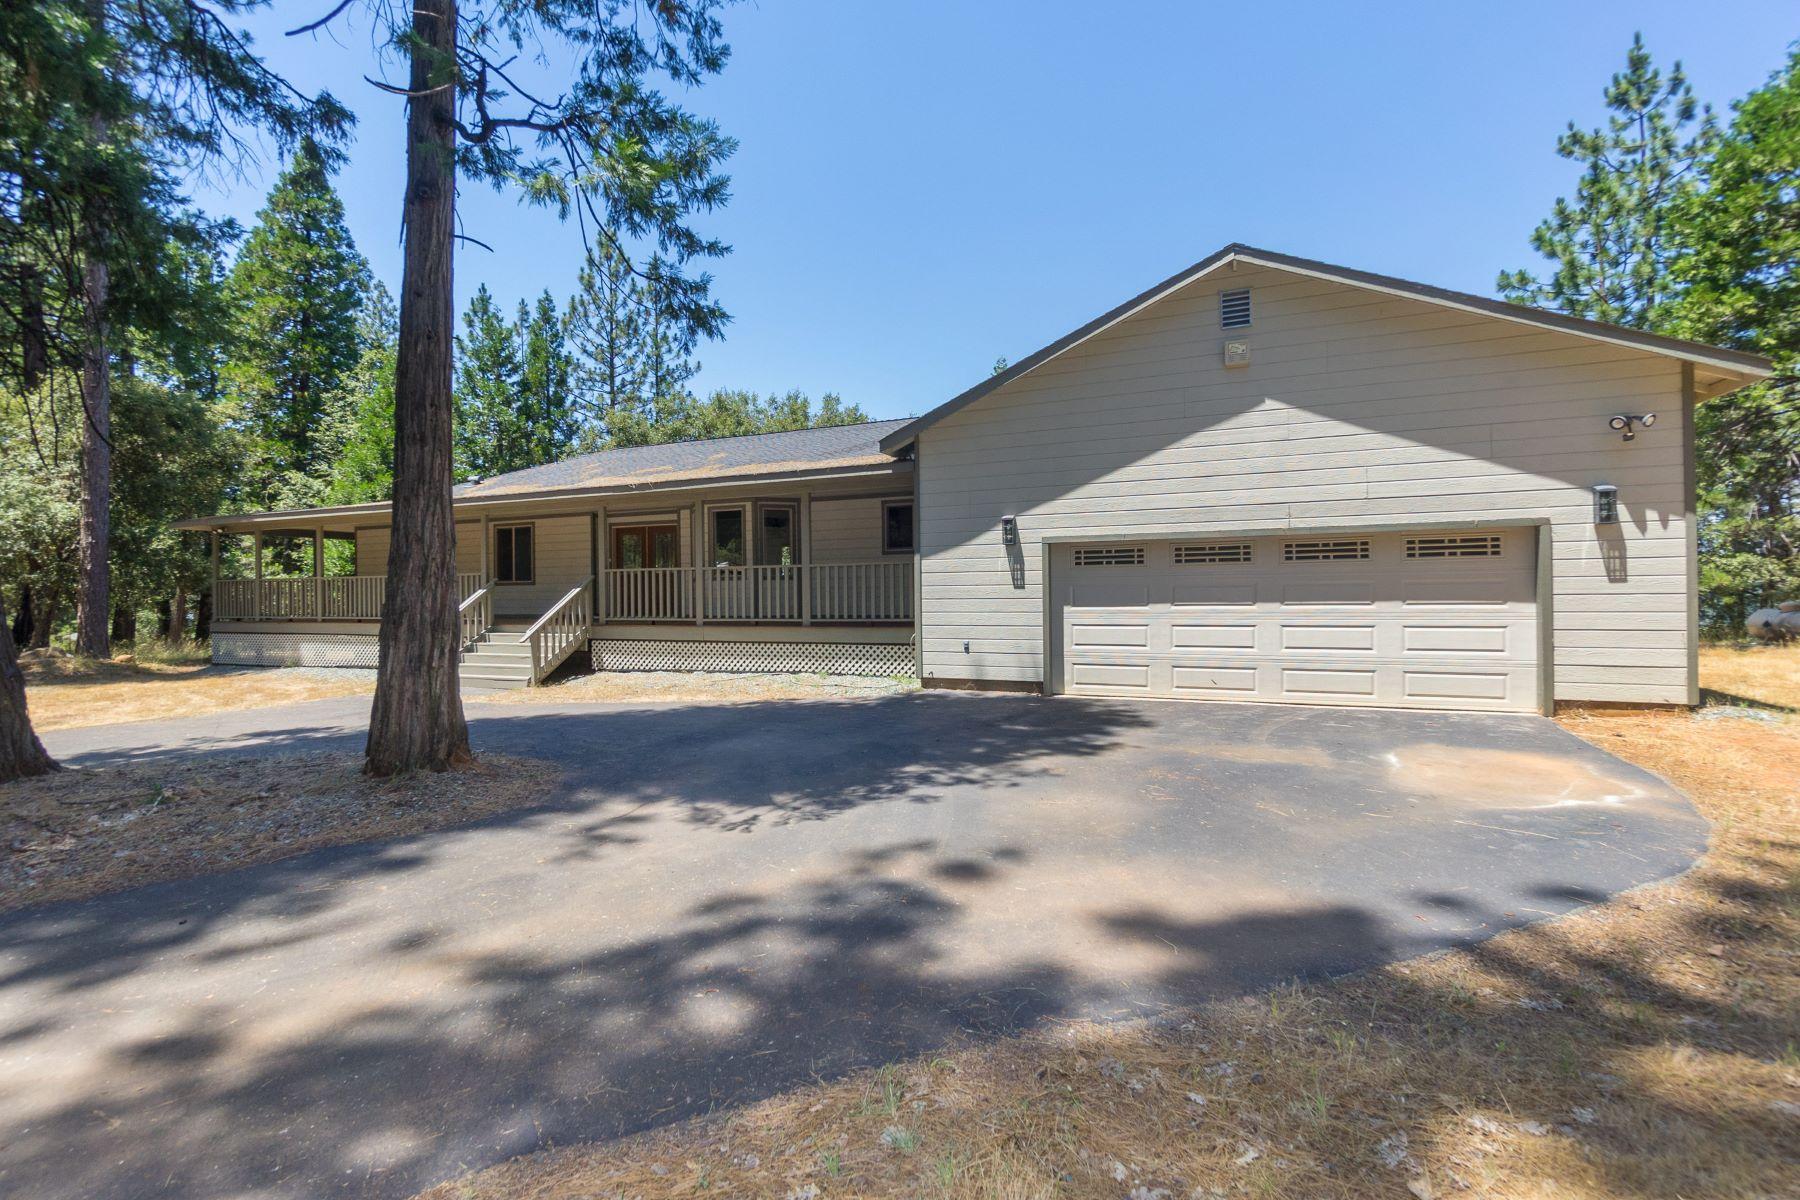 Single Family Home for Sale at 24201 Shake Ridge Road Volcano, California 95689 United States